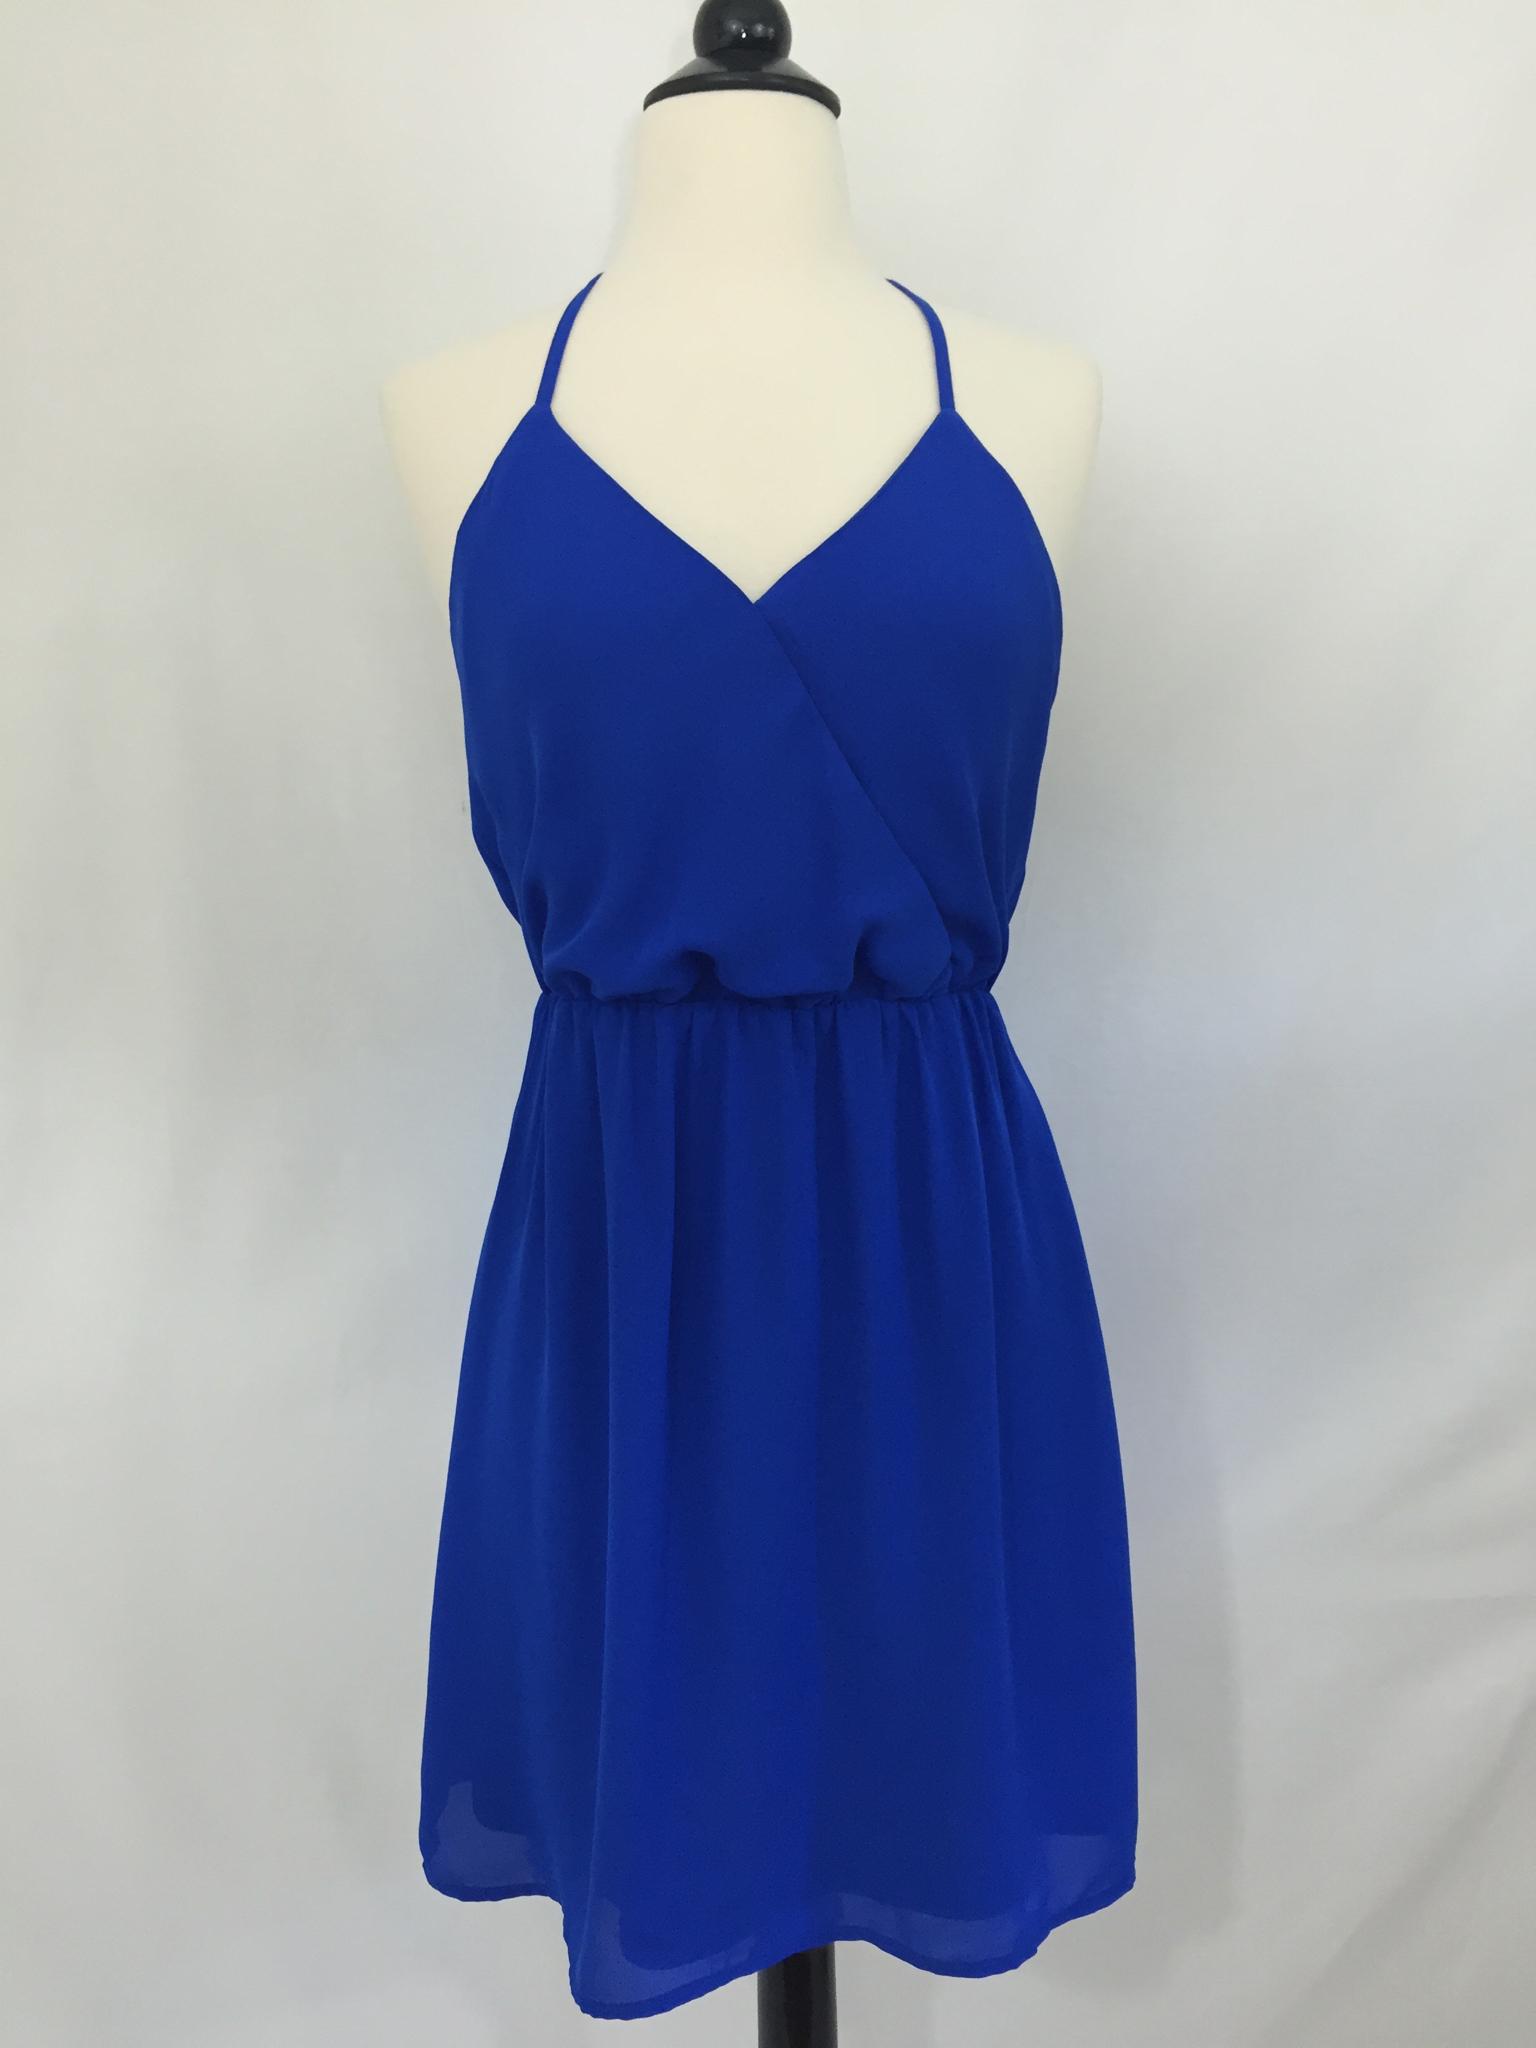 Blue tea dress